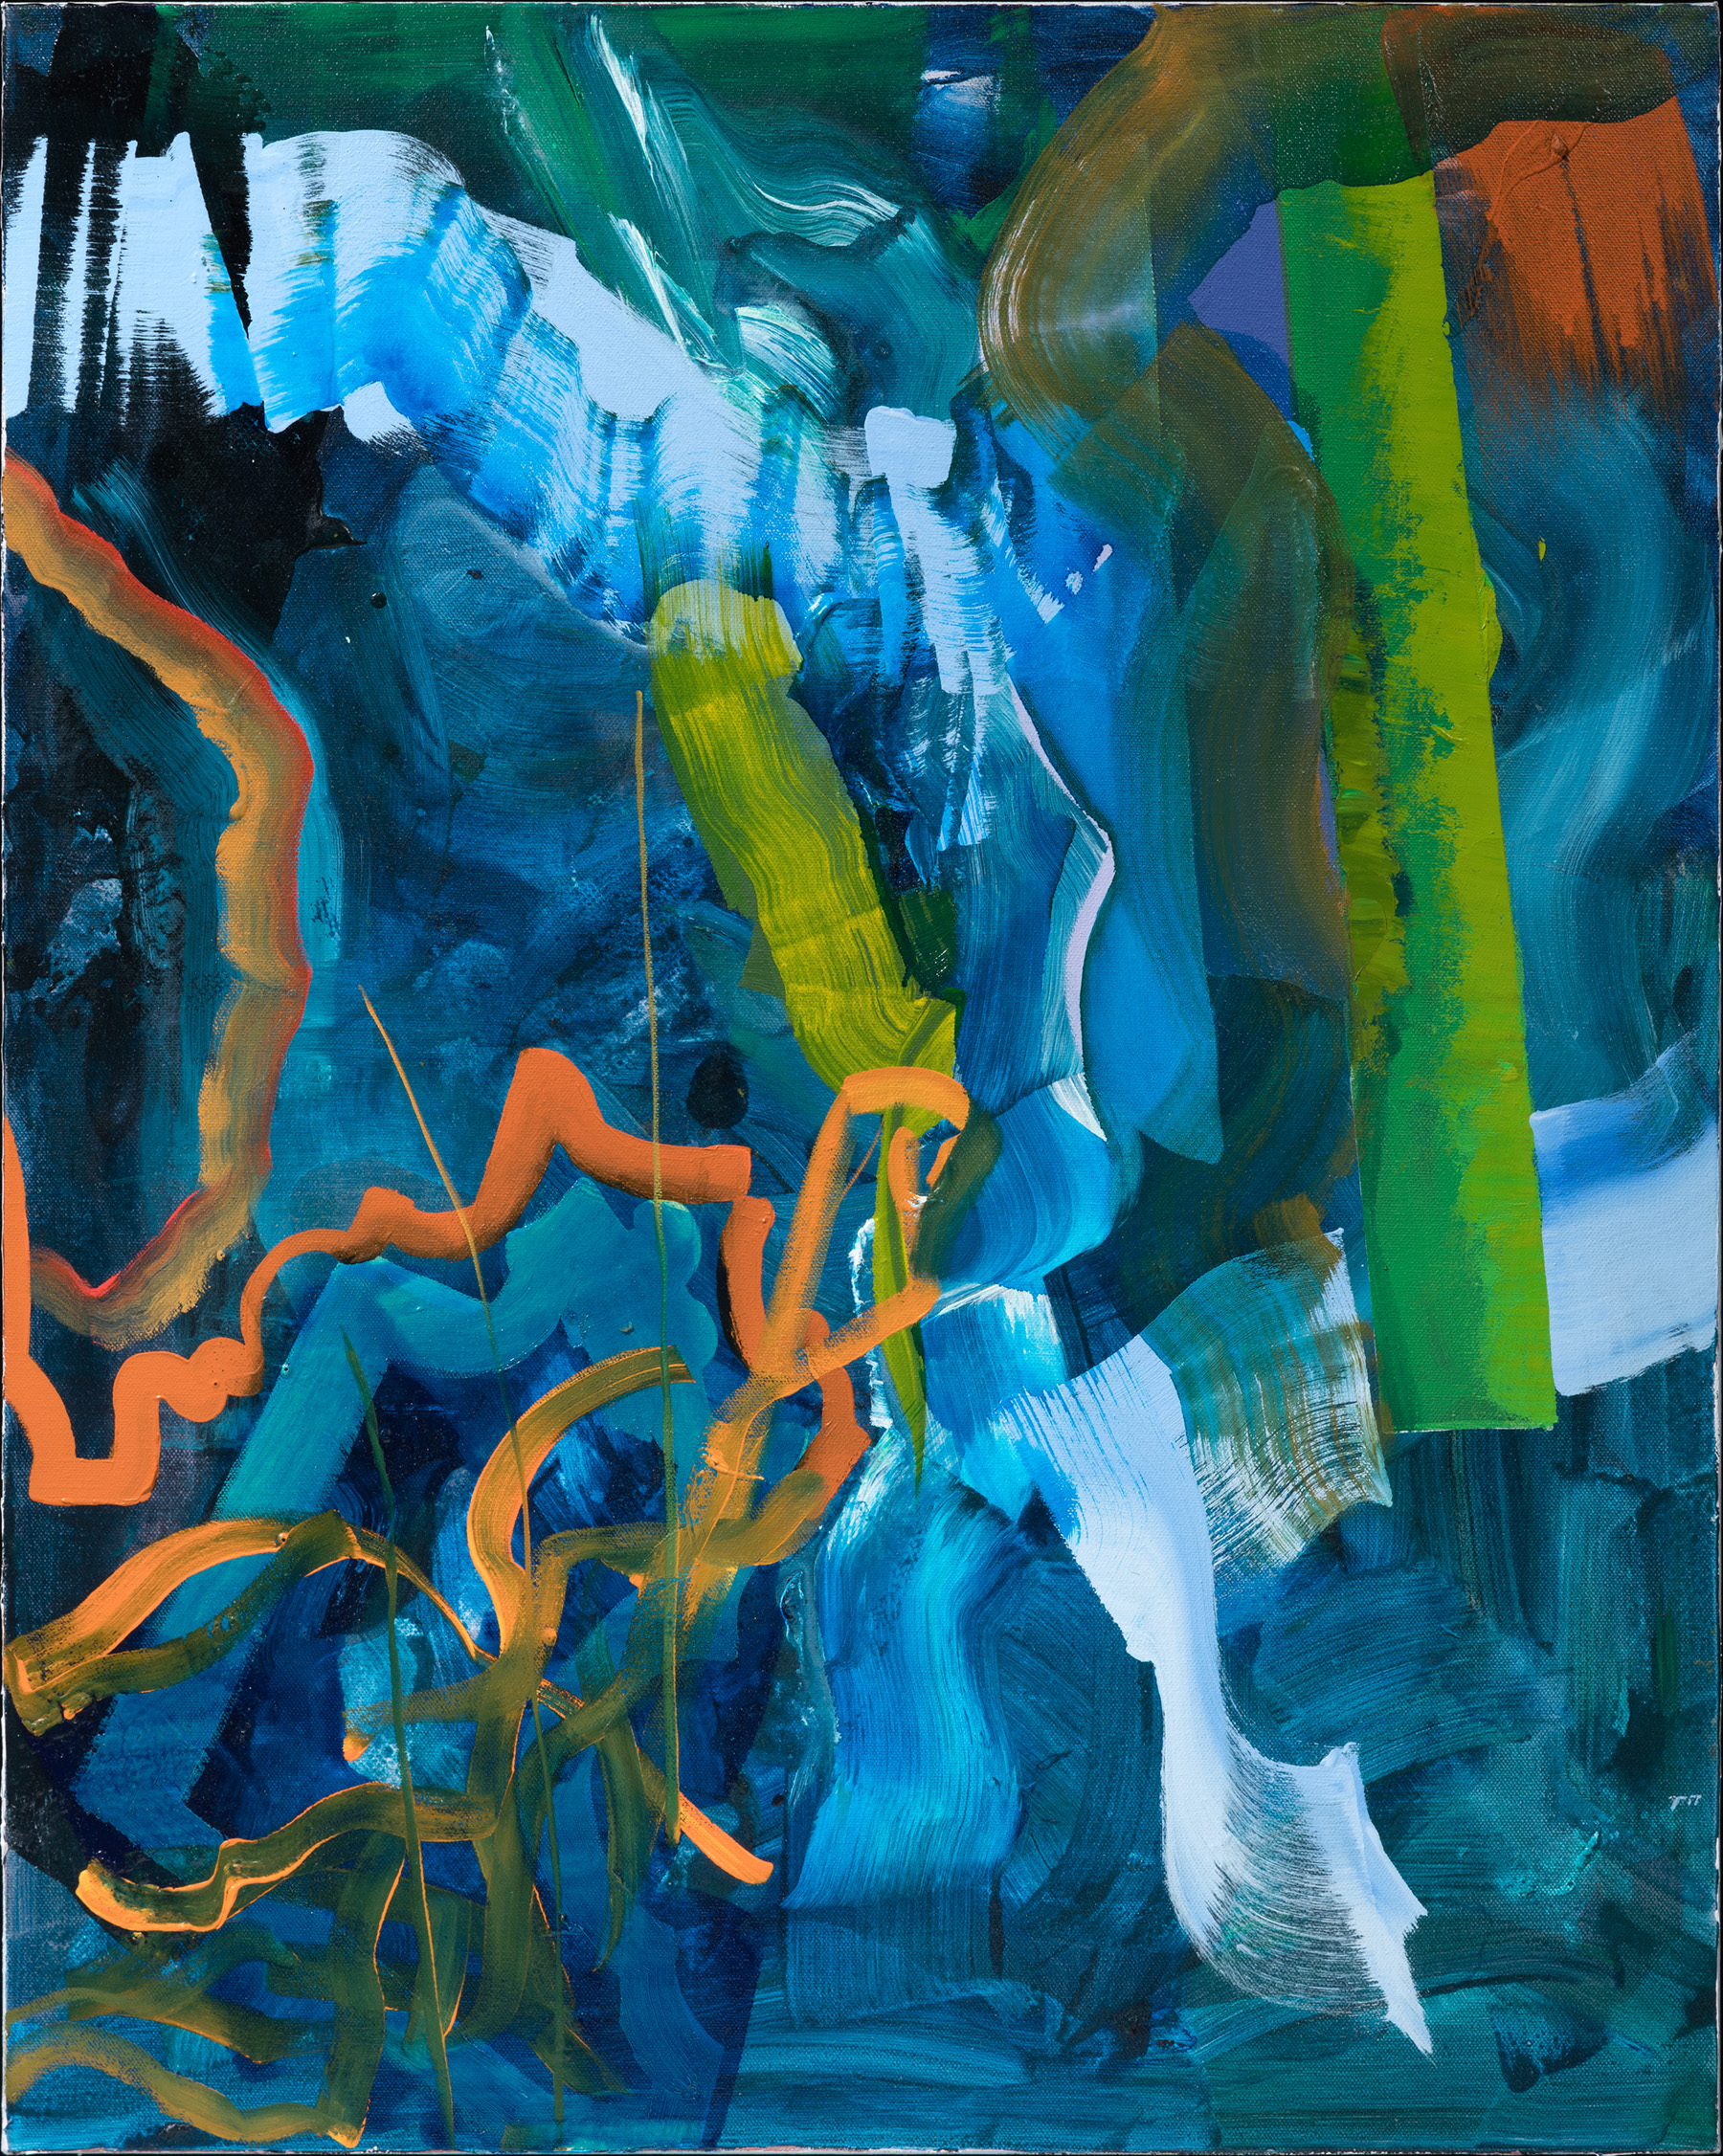 Marine Fantasy - oil acrylic painting by Artist Irwin E Thompson